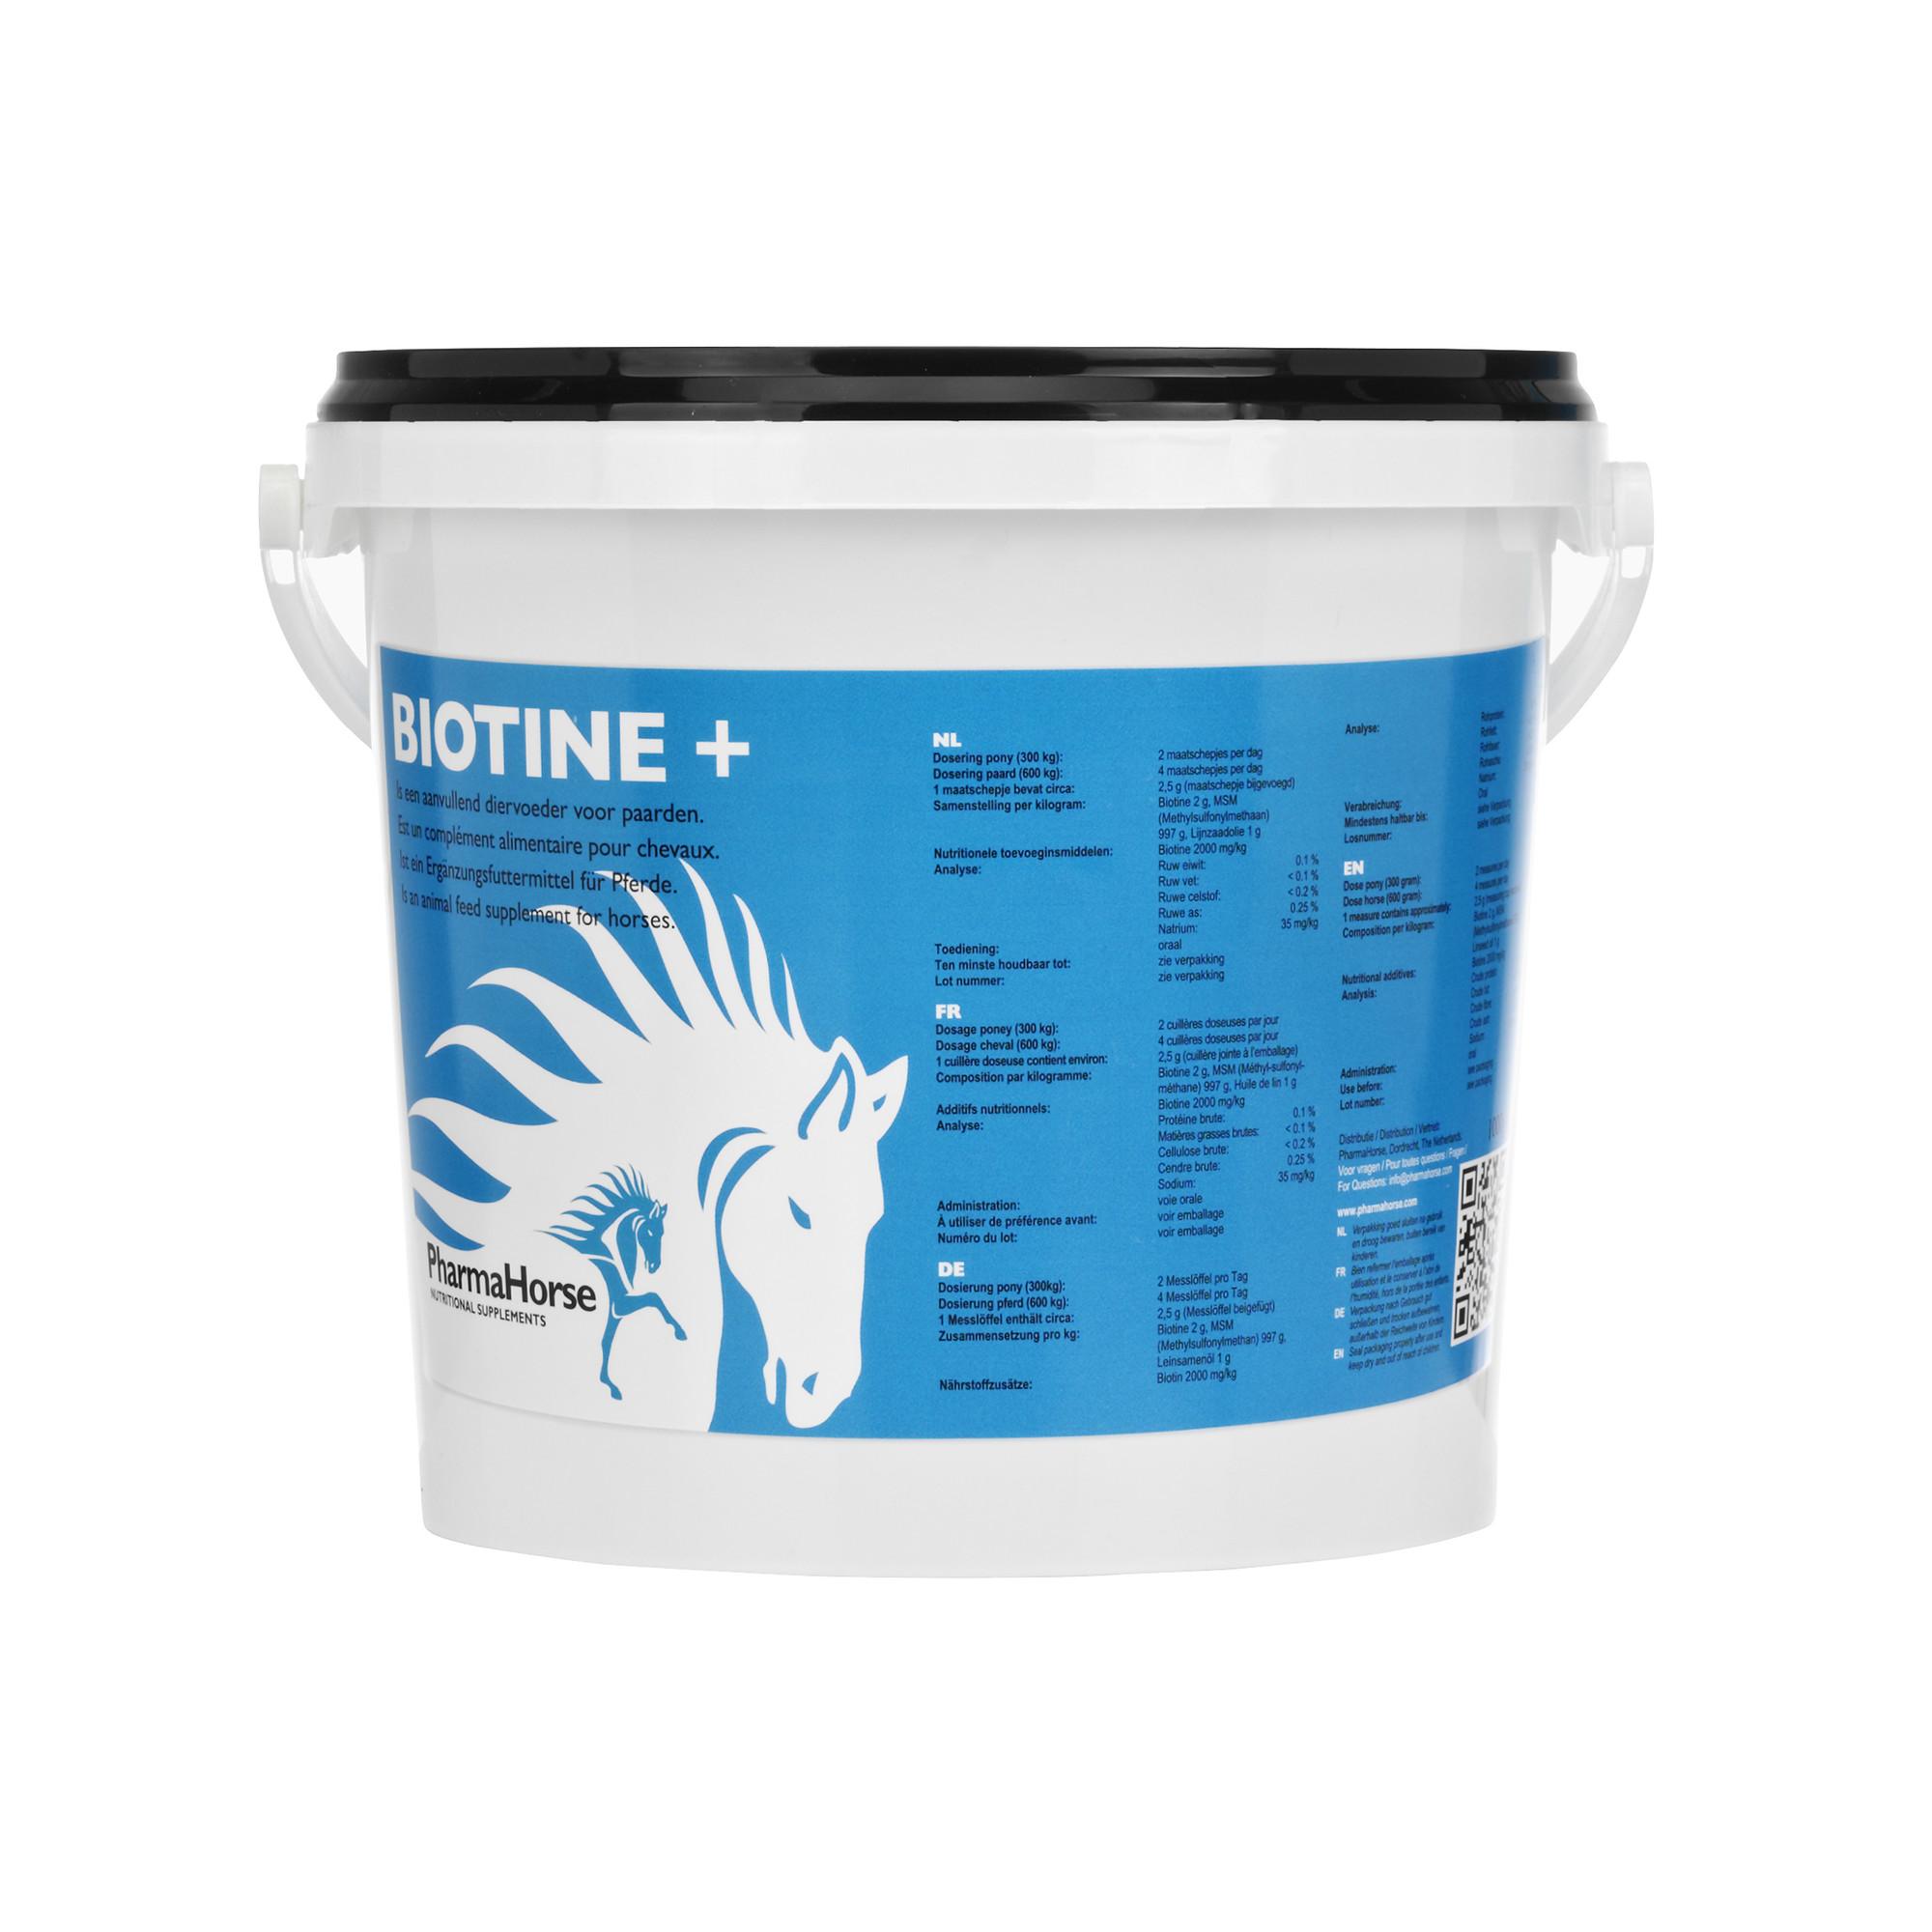 PharmaHorse Biotine +